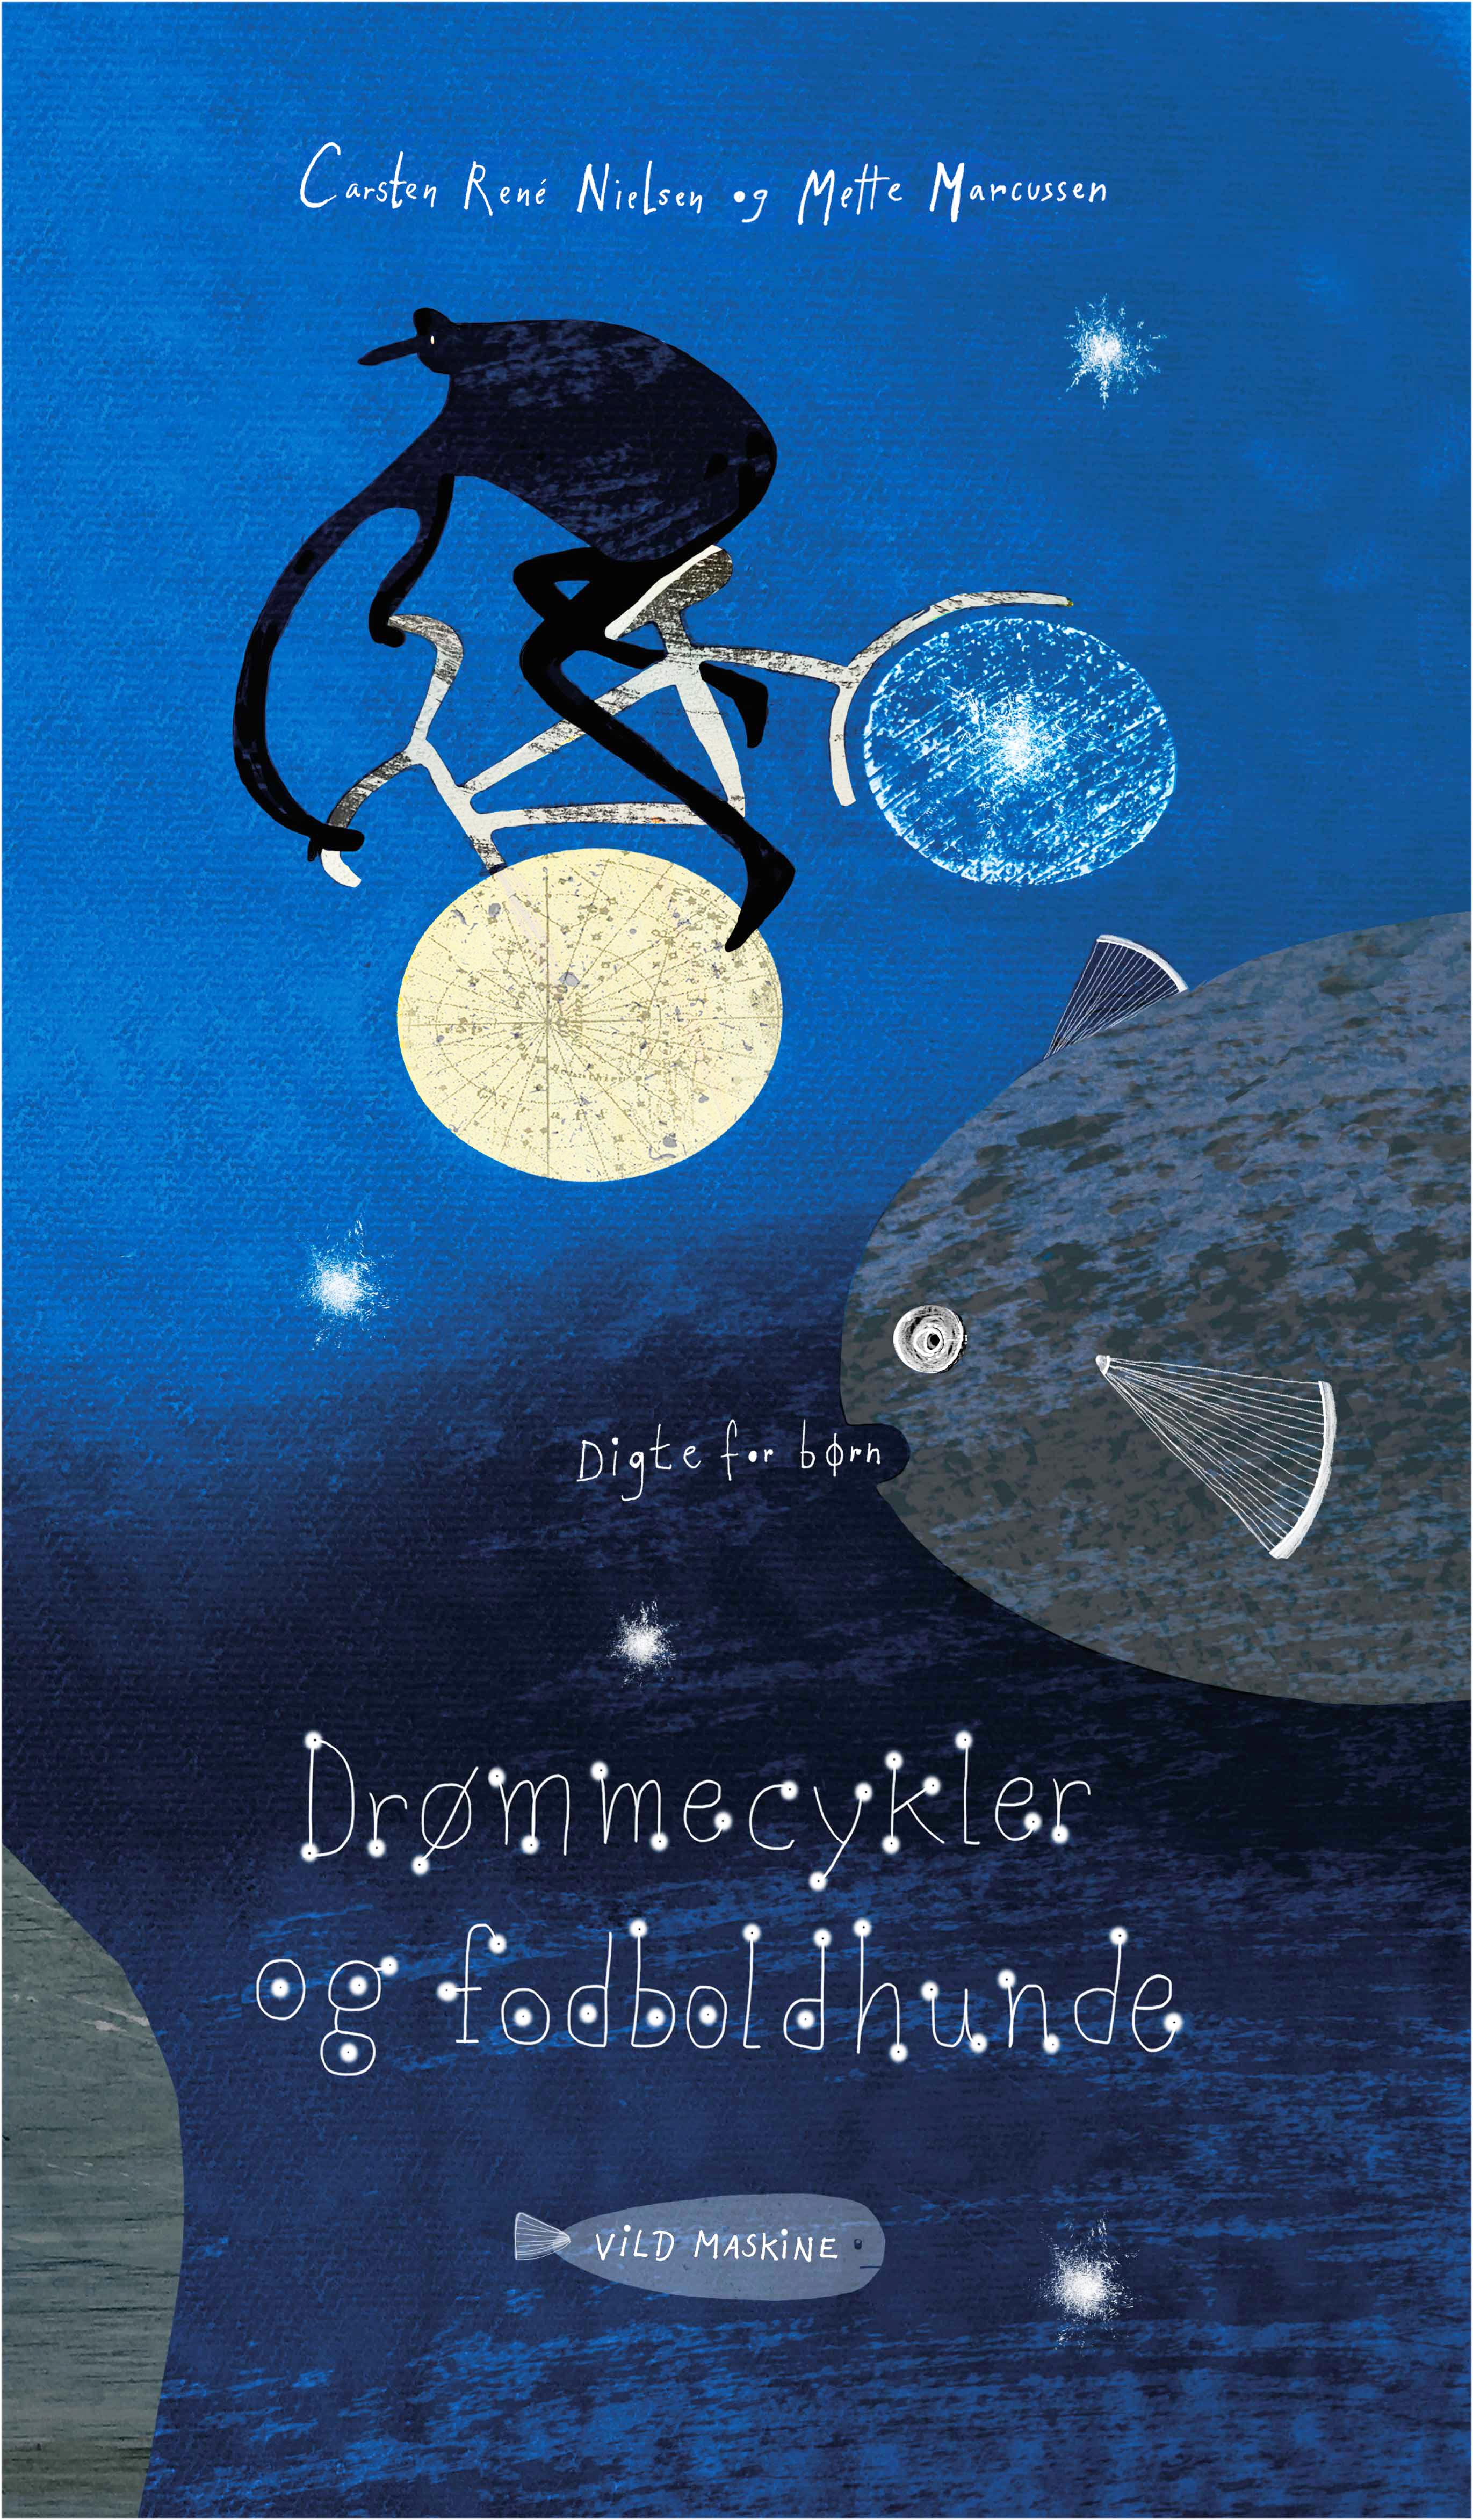 Drømmecykler og fodboldhunde, poetry for children. Sold to Armenia.